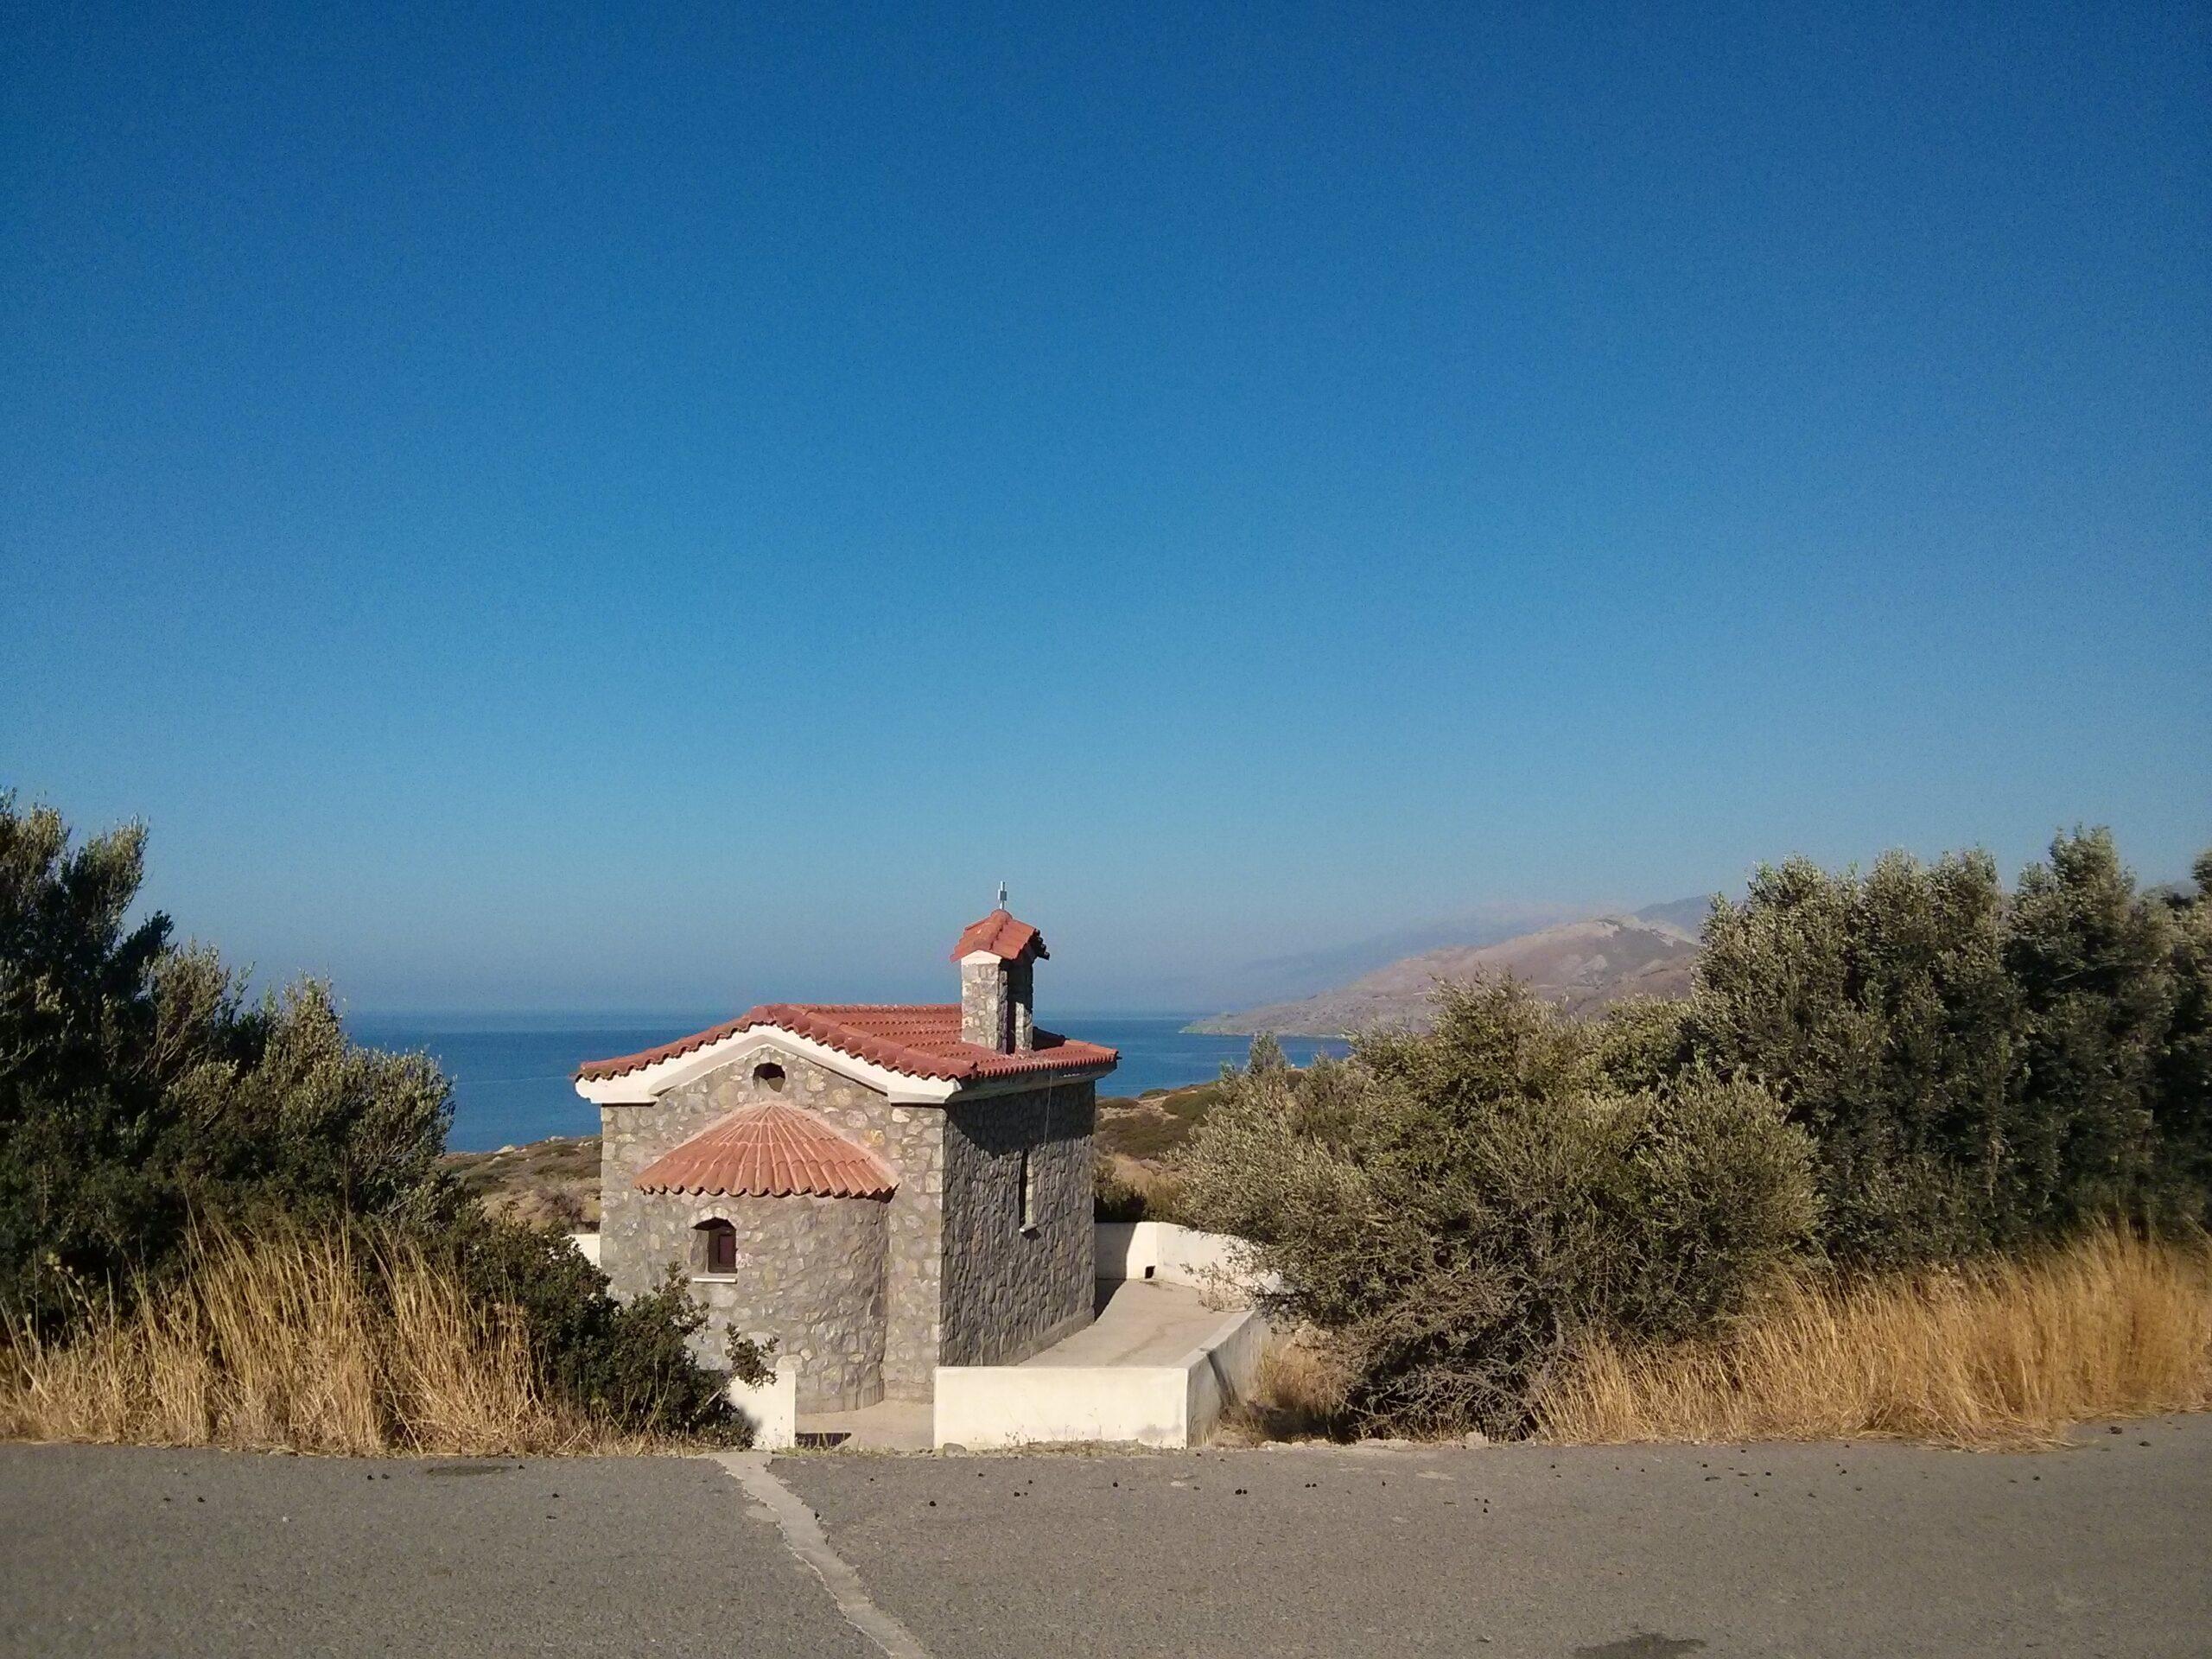 25. My Travels: 2006, Part Two – Exploring Crete